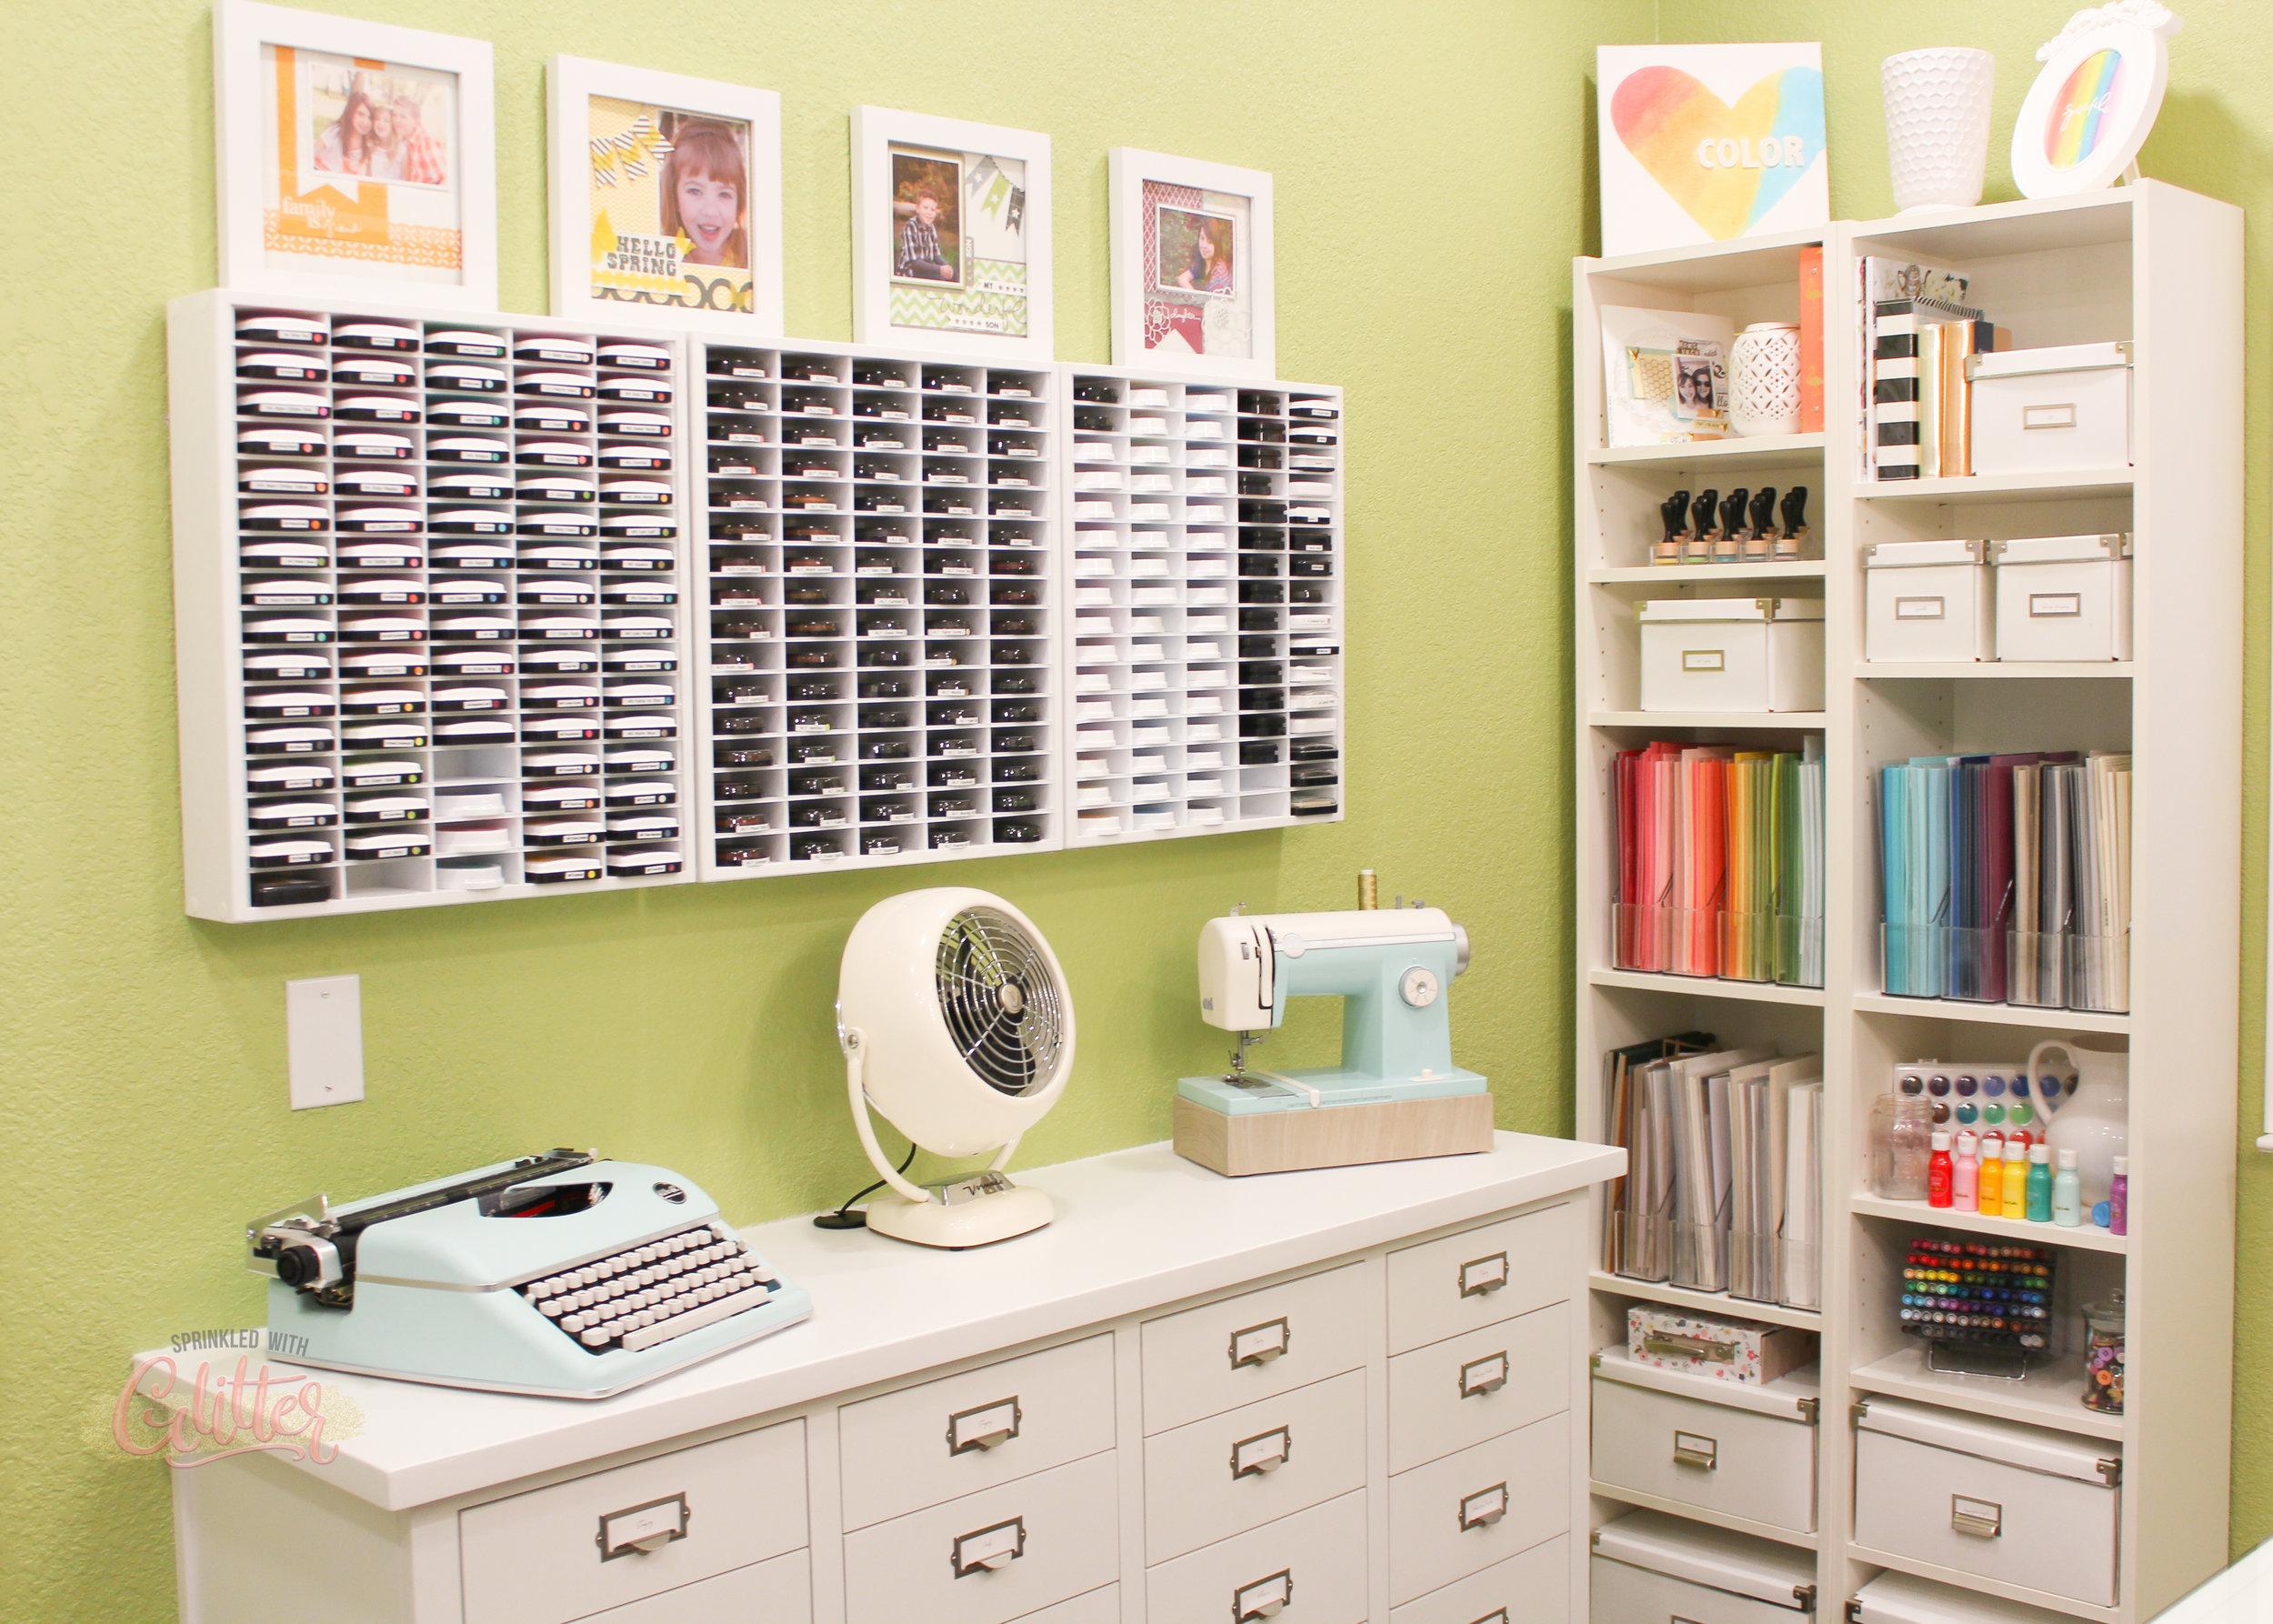 Save On Organize More Ink Storage Organizer Craft Room Organization Sprinkled With Glitter